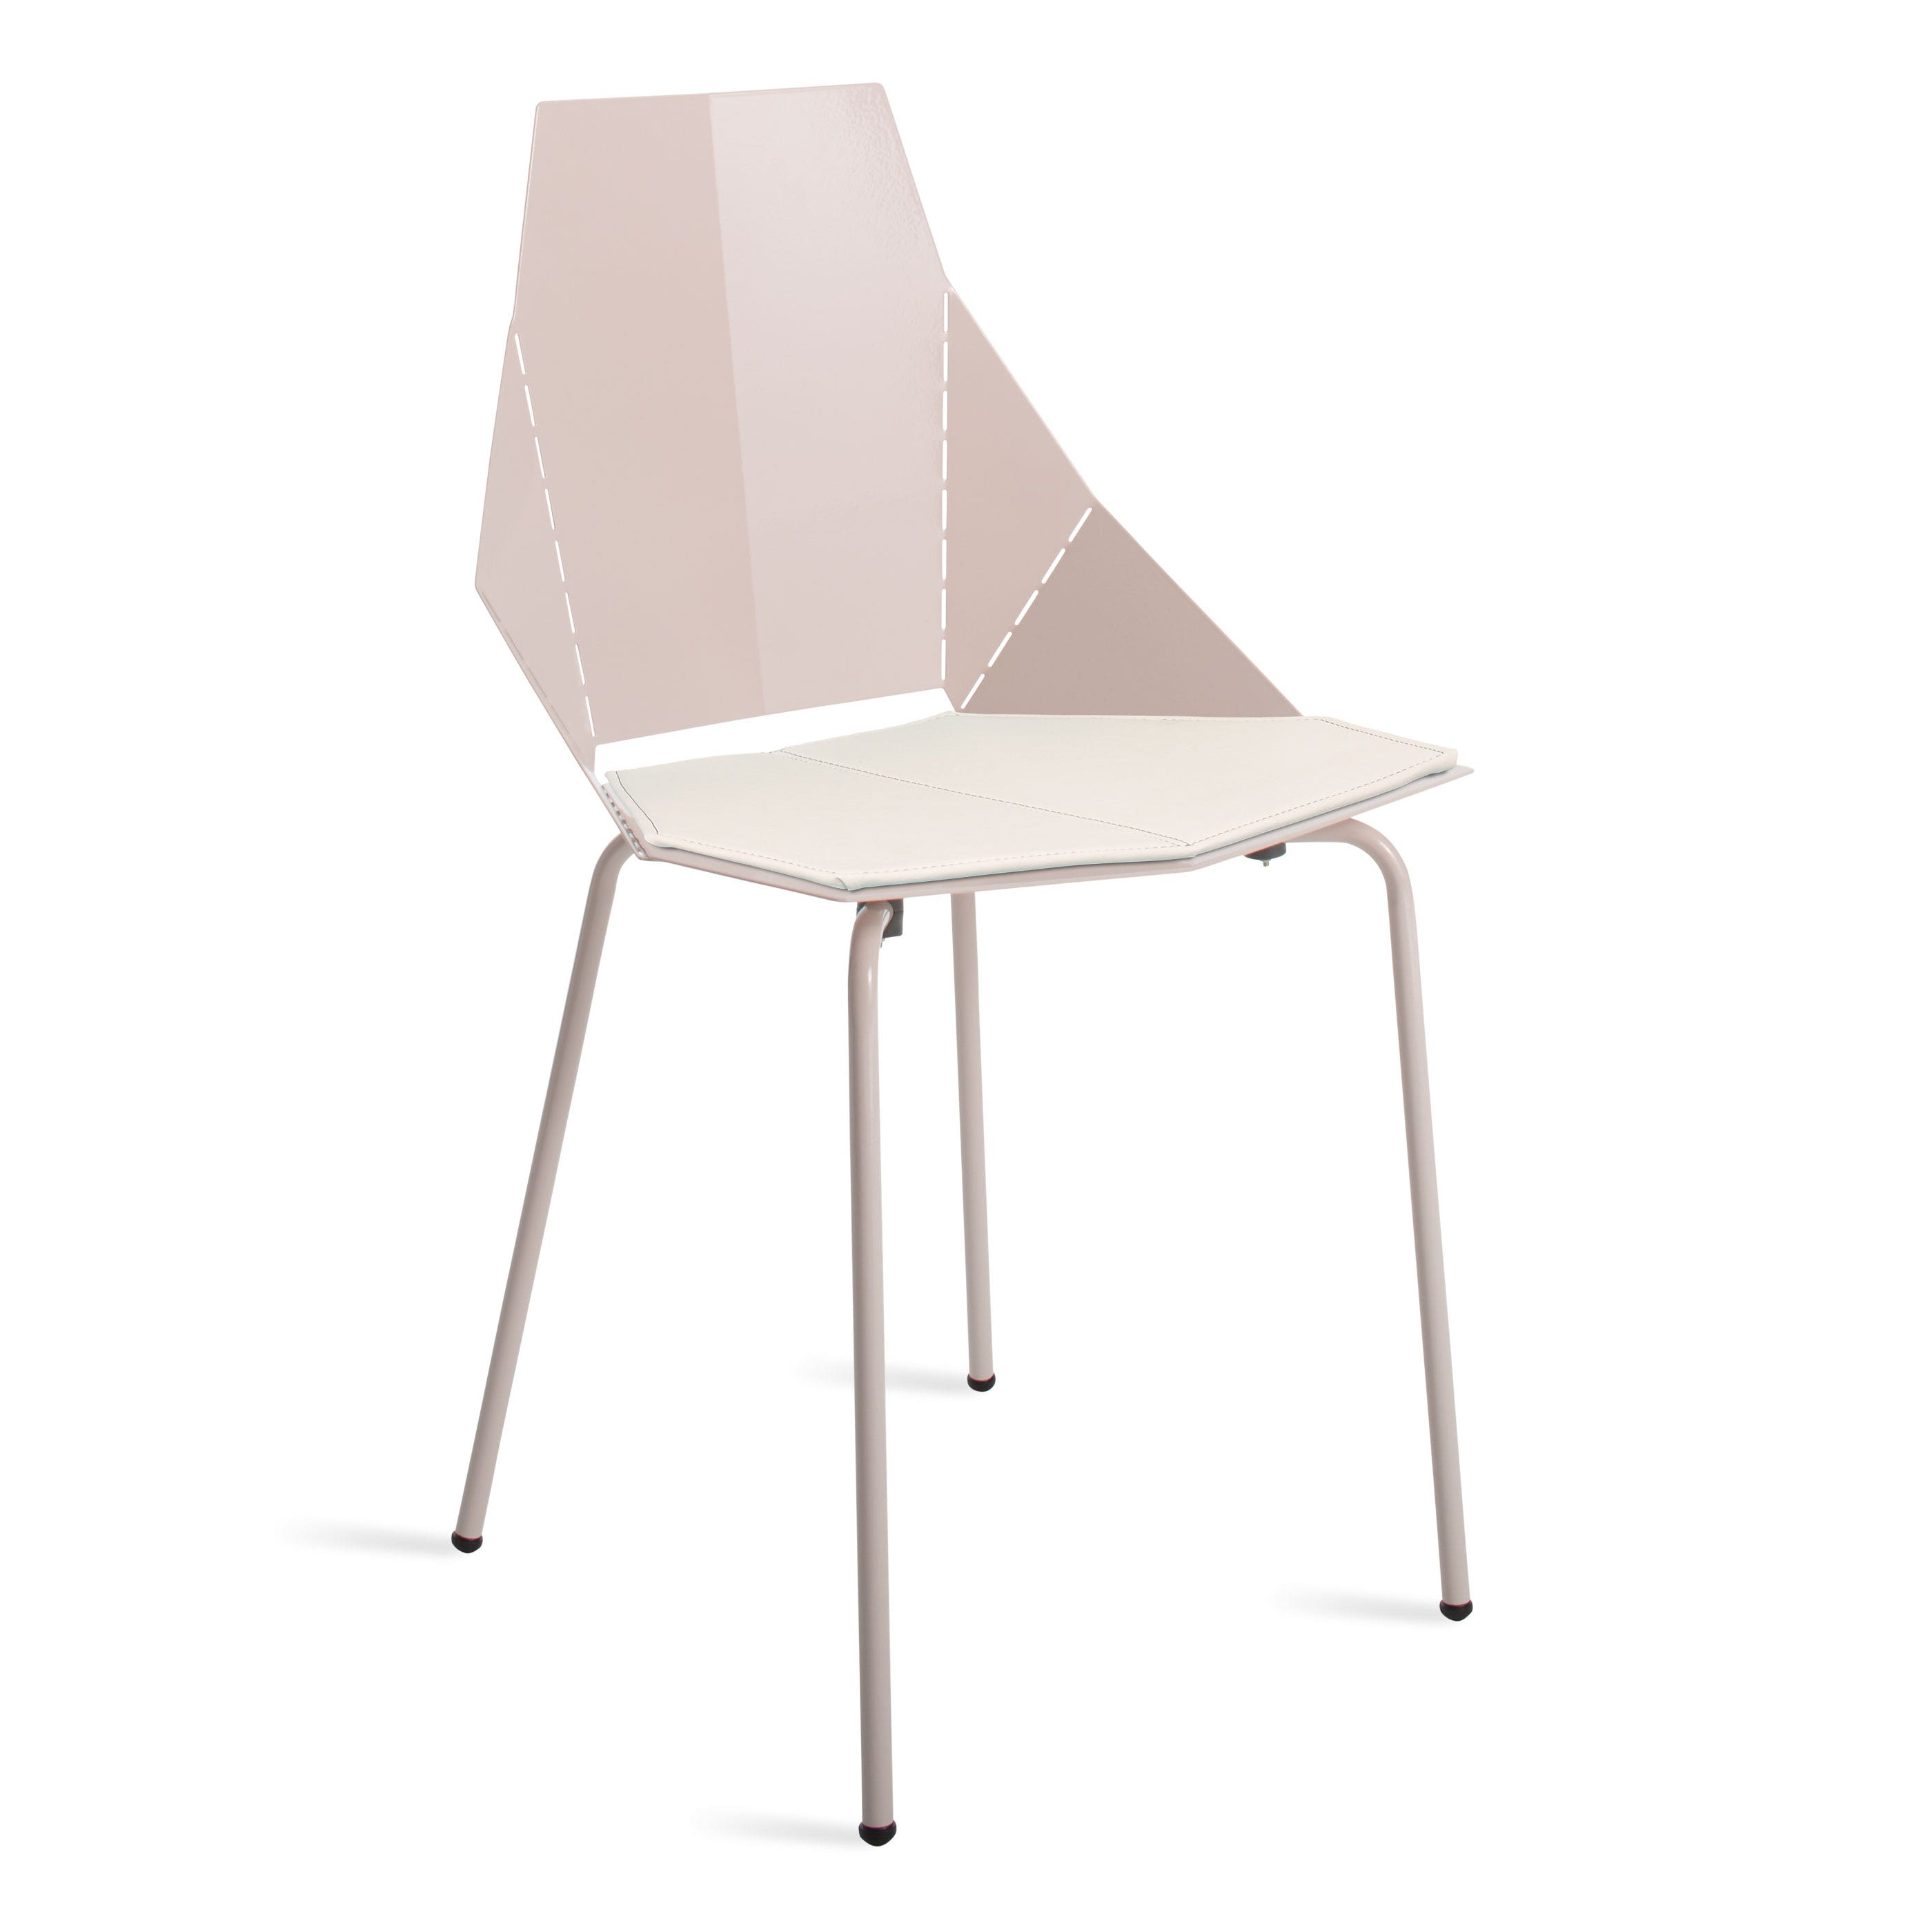 Real Good Chair Pad Modern Seating Blu Dot – White Chair Pad